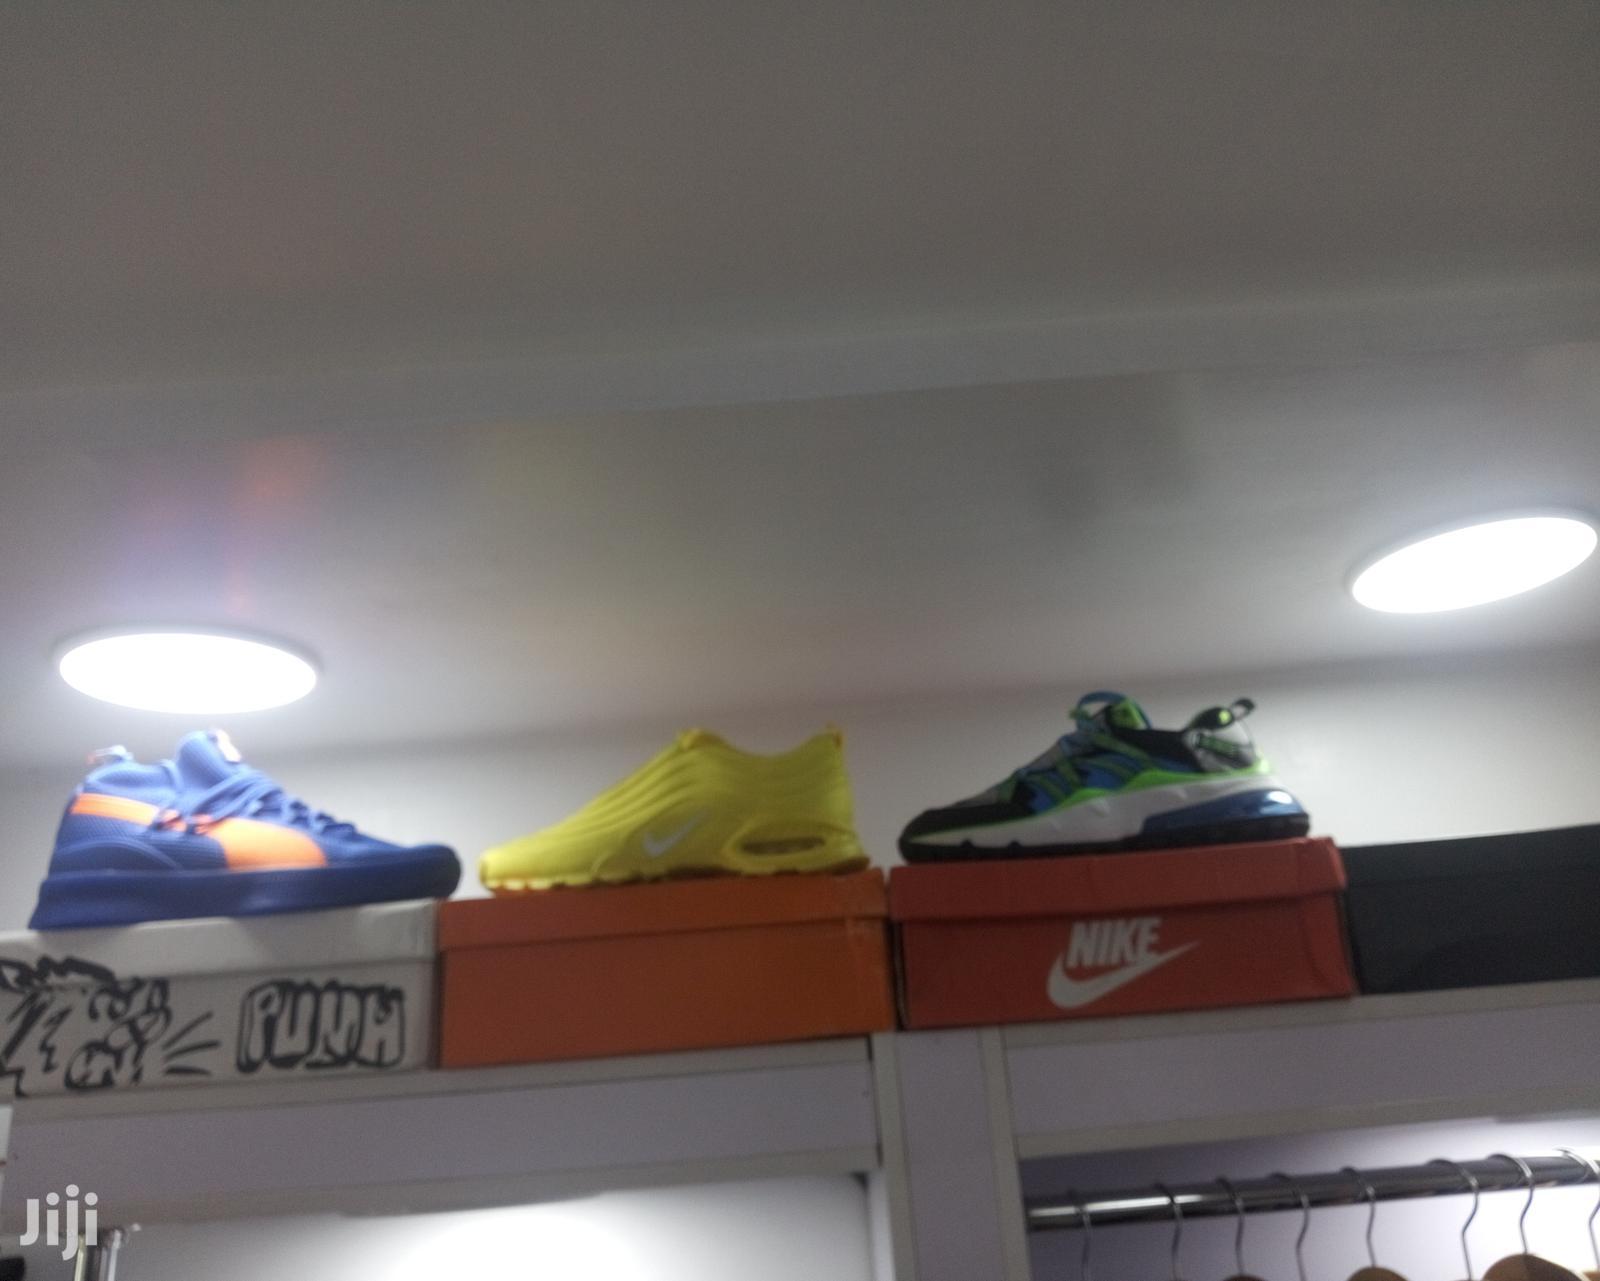 Brand New Original Nike Foot Wear